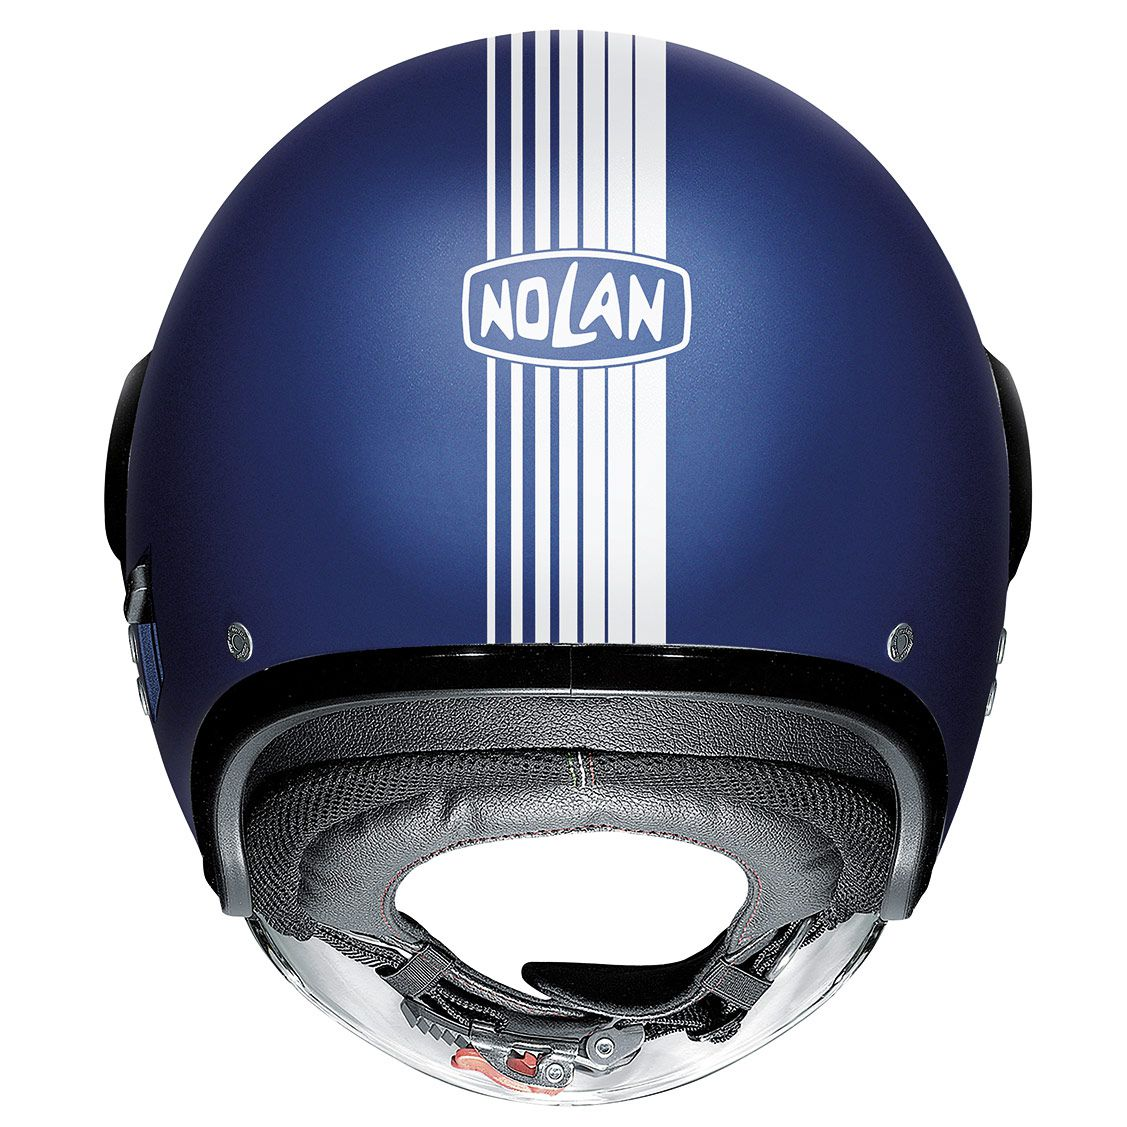 Capacete Nolan N21 Joi De Vivre Azul Fosco (53) - Com Óculos Interno  - Planet Bike Shop Moto Acessórios